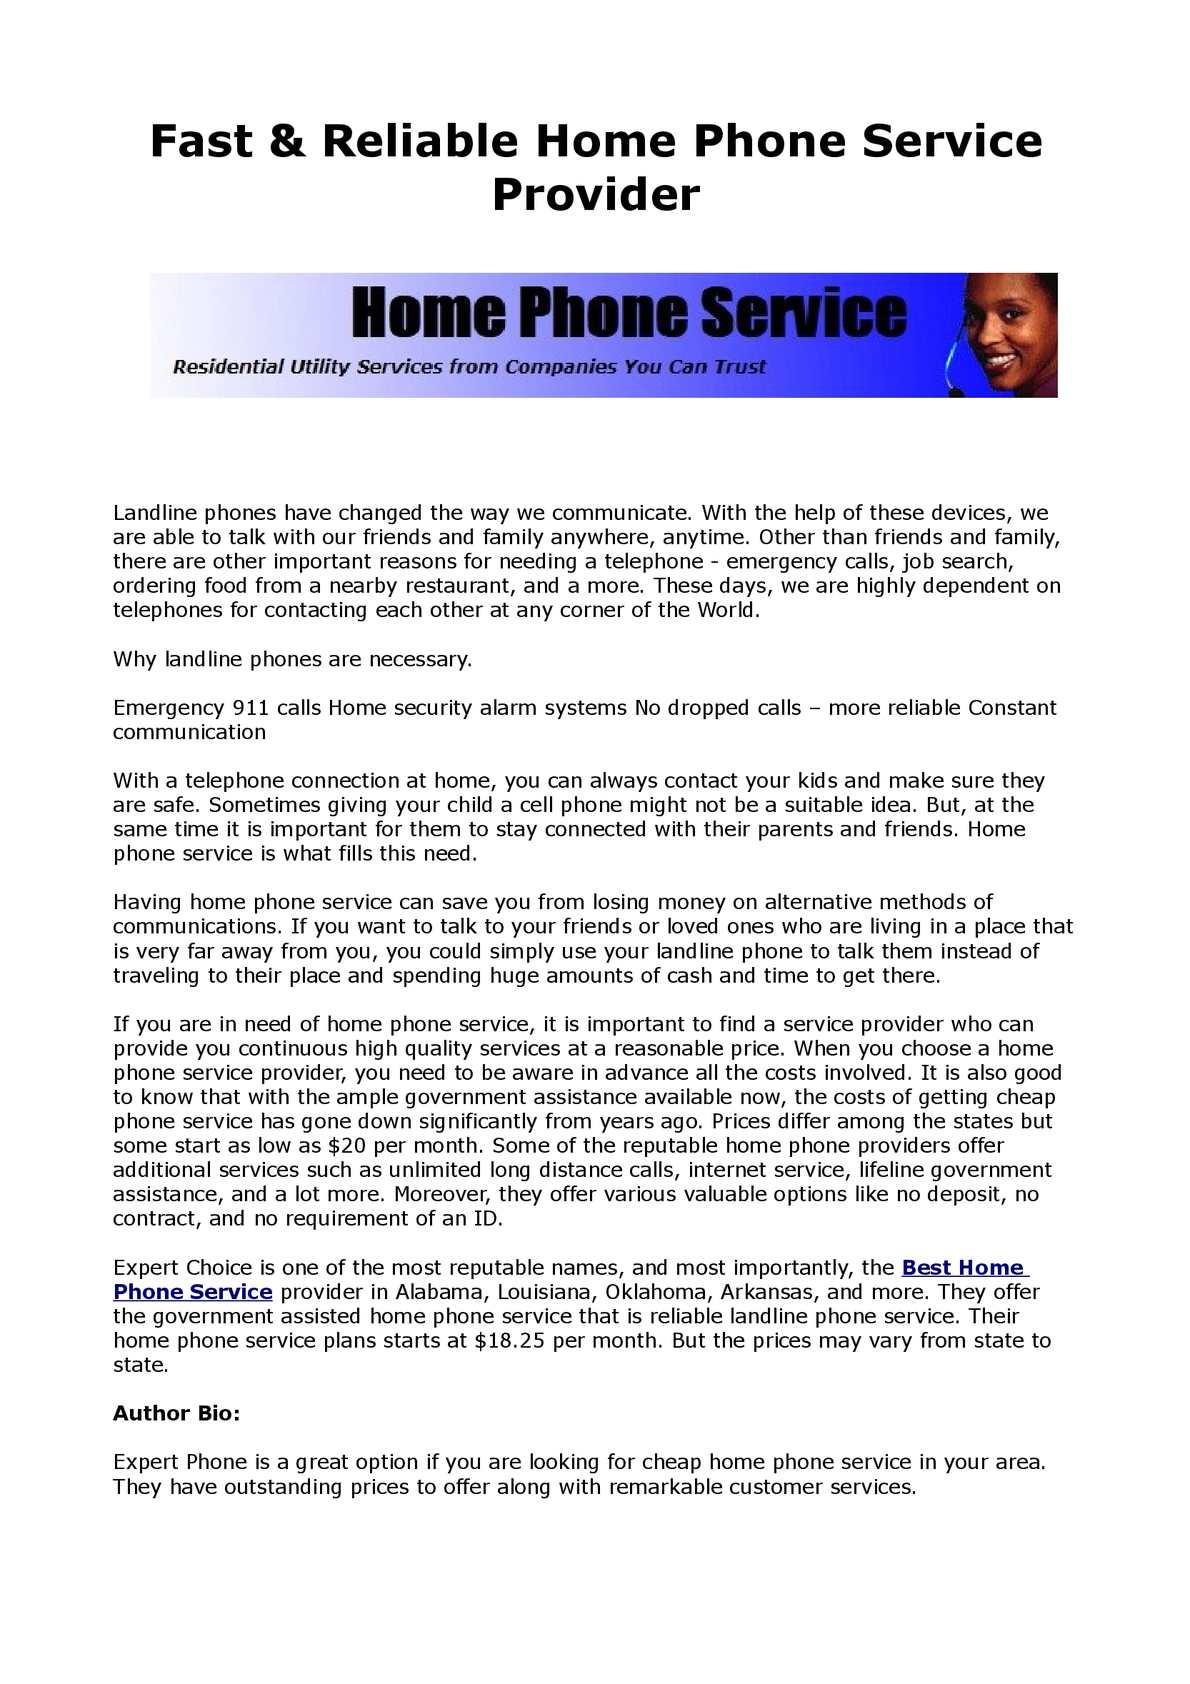 Landline Phone Service >> Calameo Fast Reliable Home Phone Service Provider